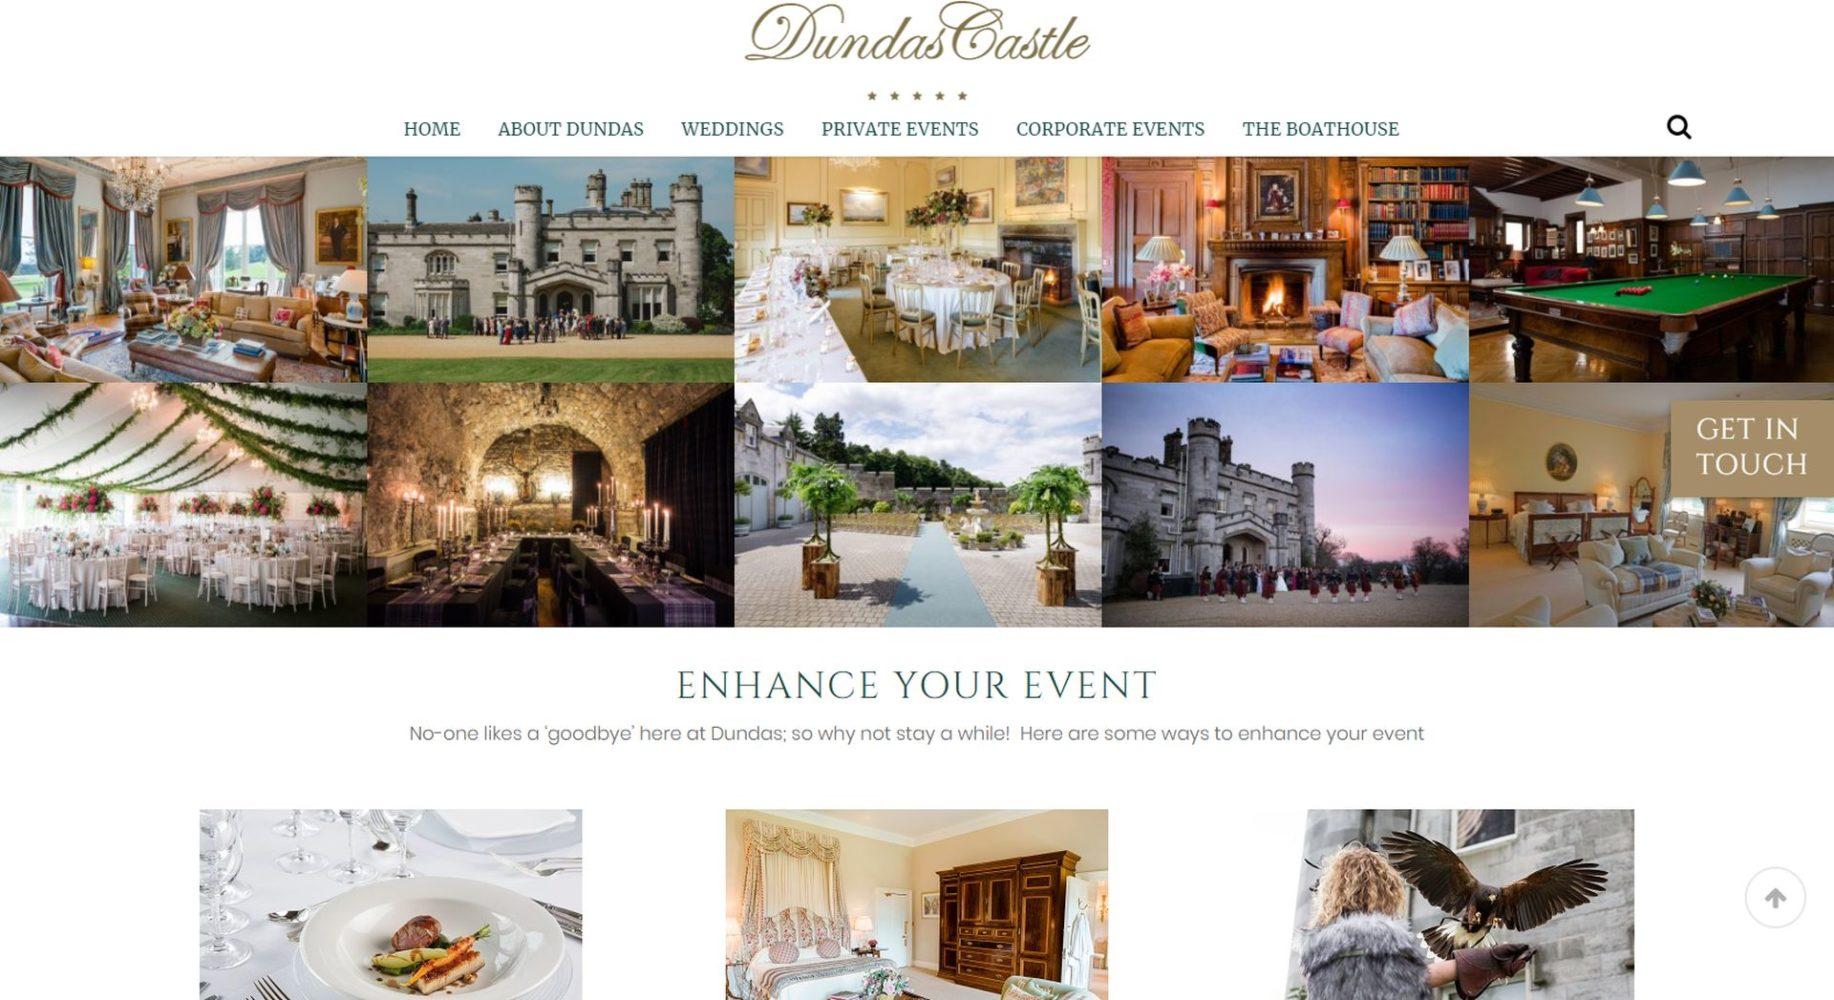 Dundas Castle Website Design Events